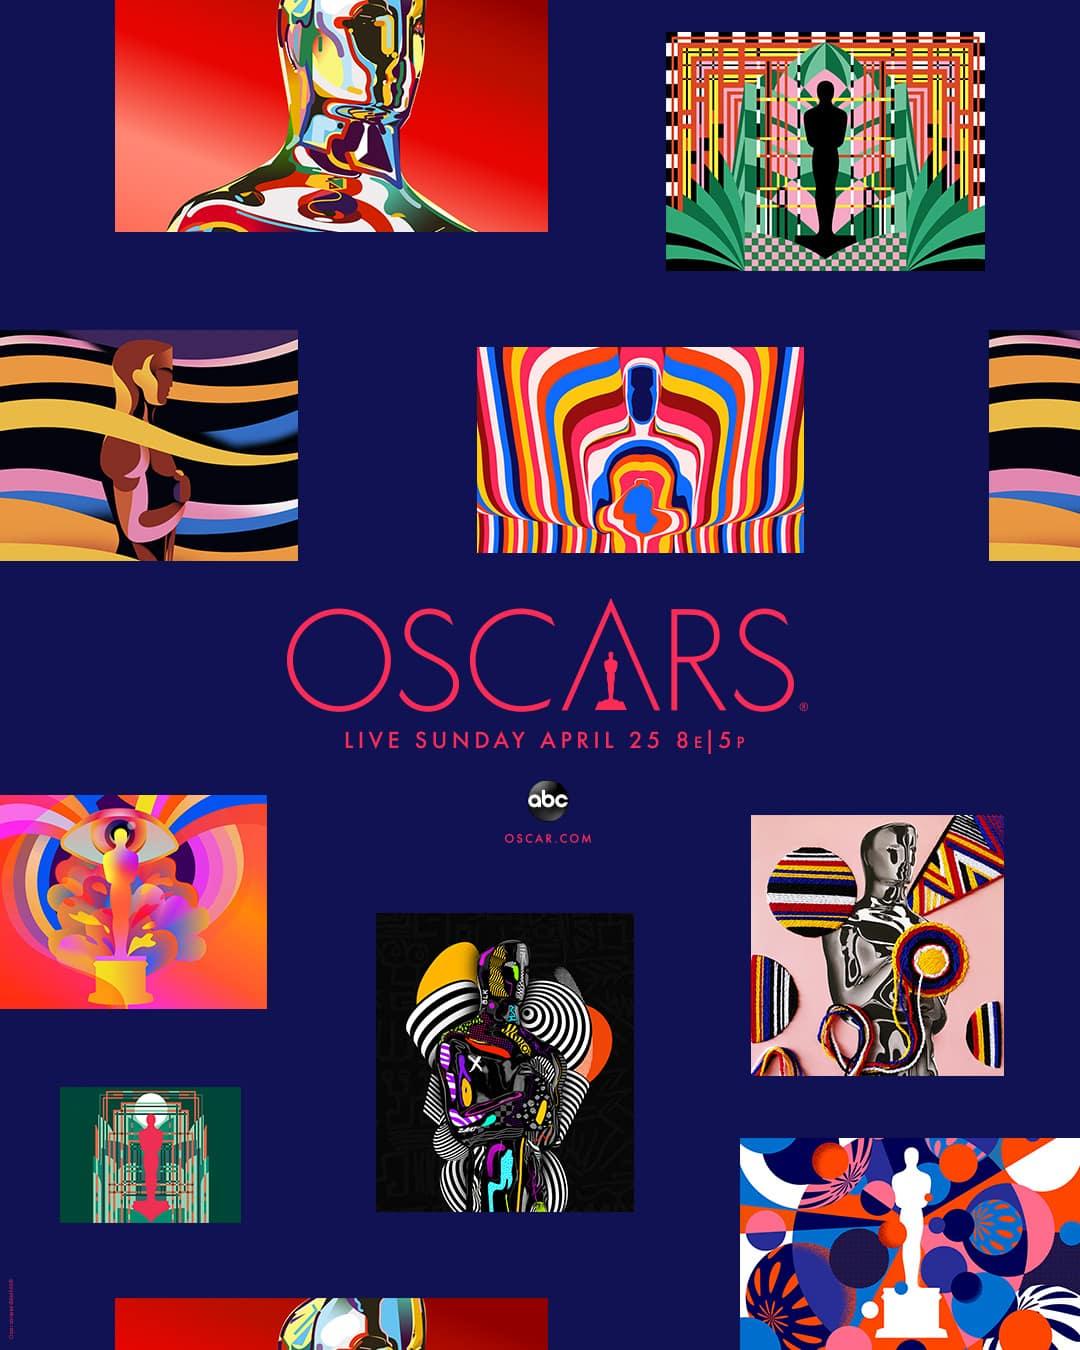 93 oscars ka poster 1080x1350 navy